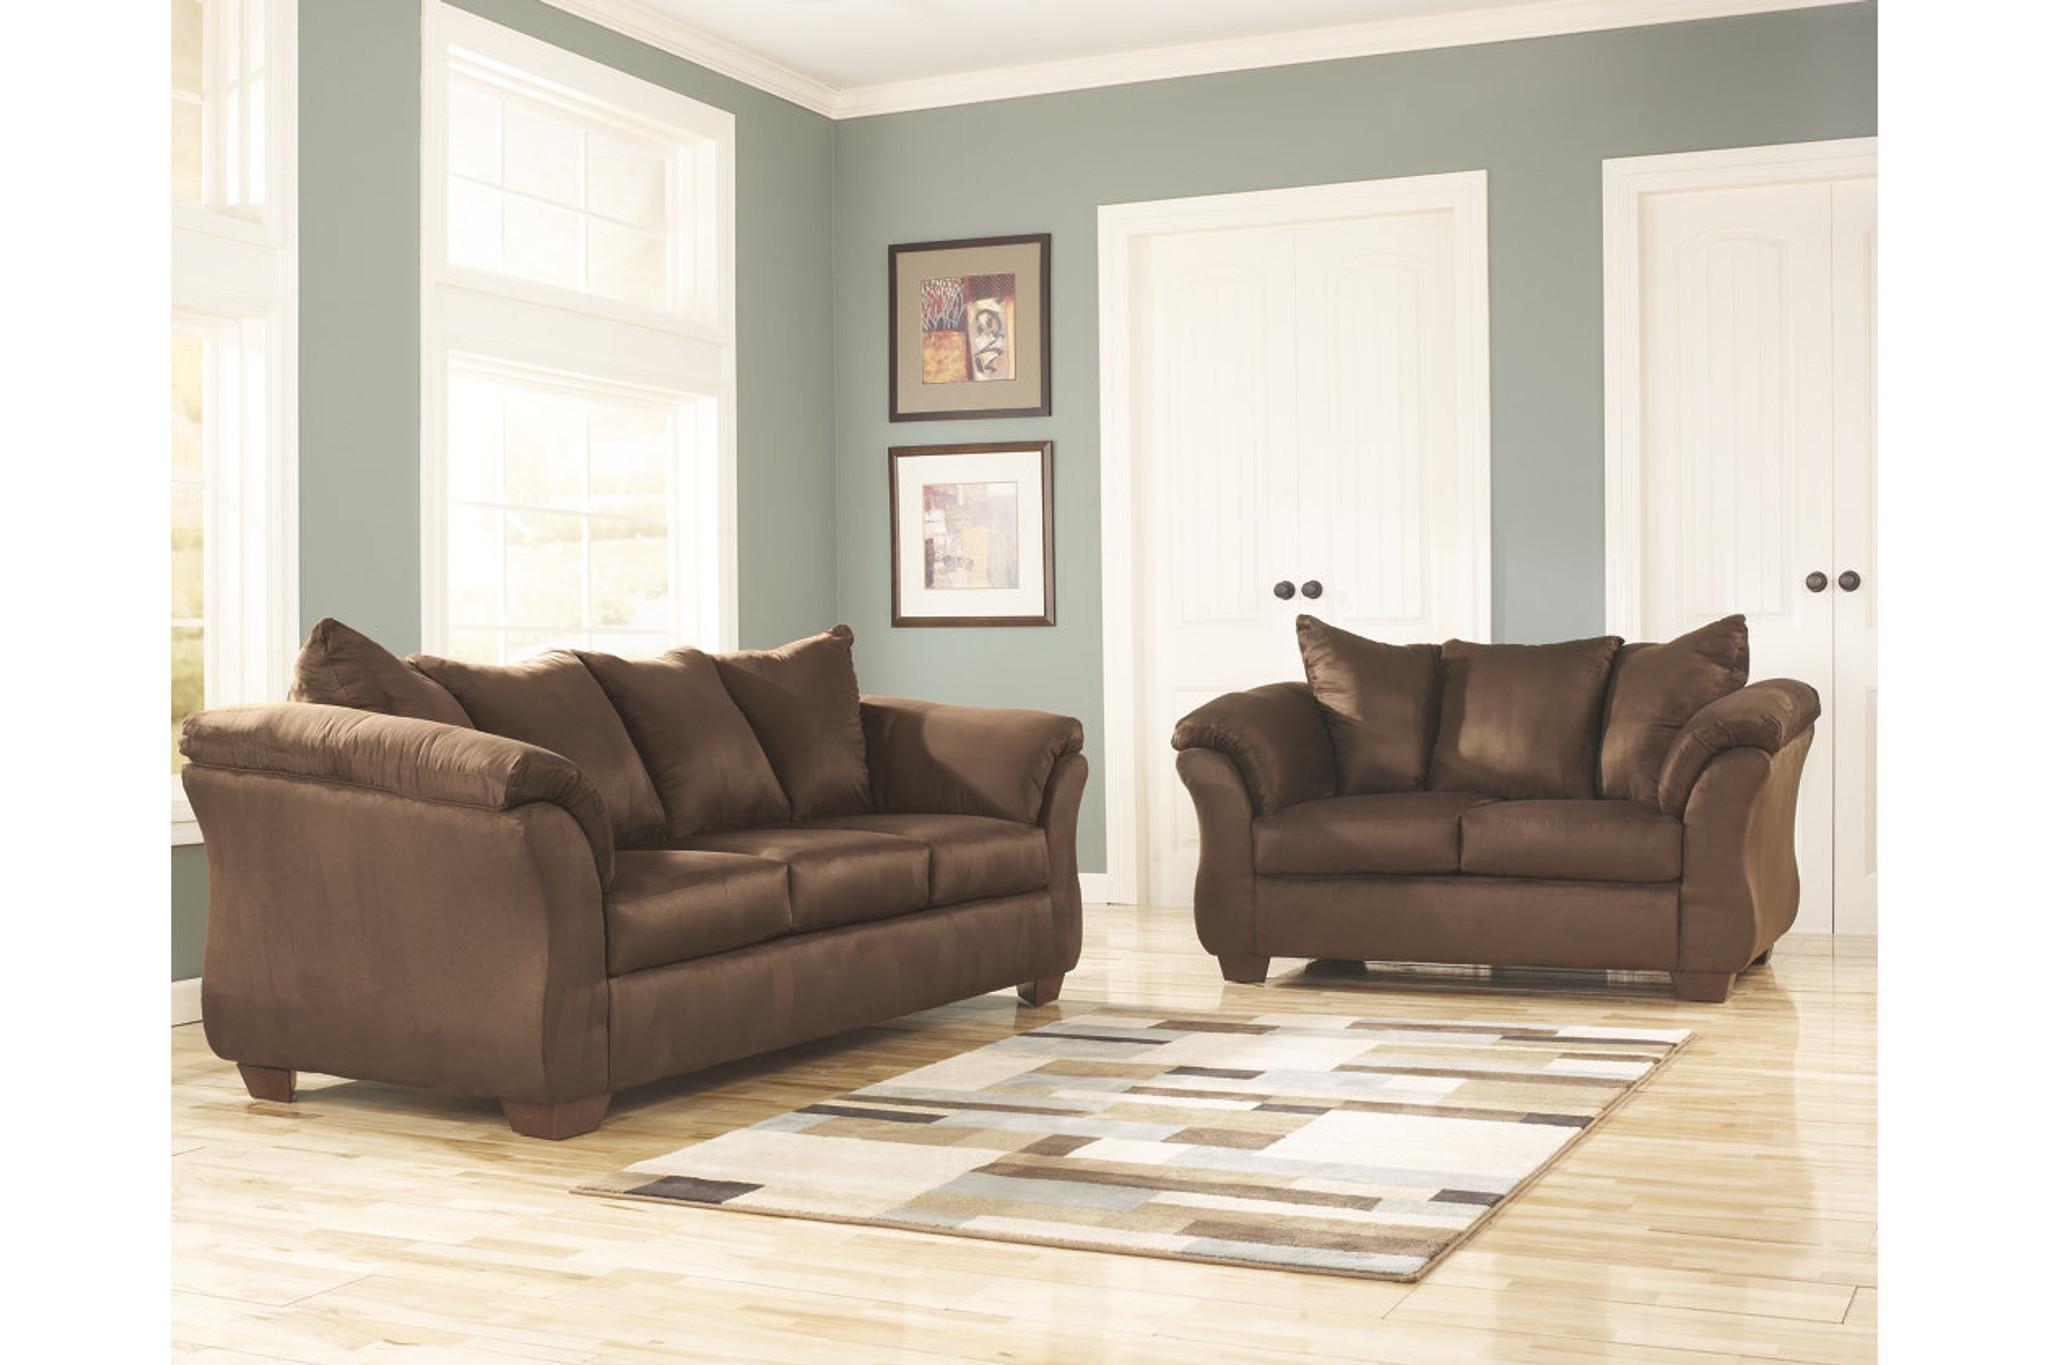 Fabulous 2 Pcs Darcy Cafe Sofa Loveseat Interior Design Ideas Apansoteloinfo